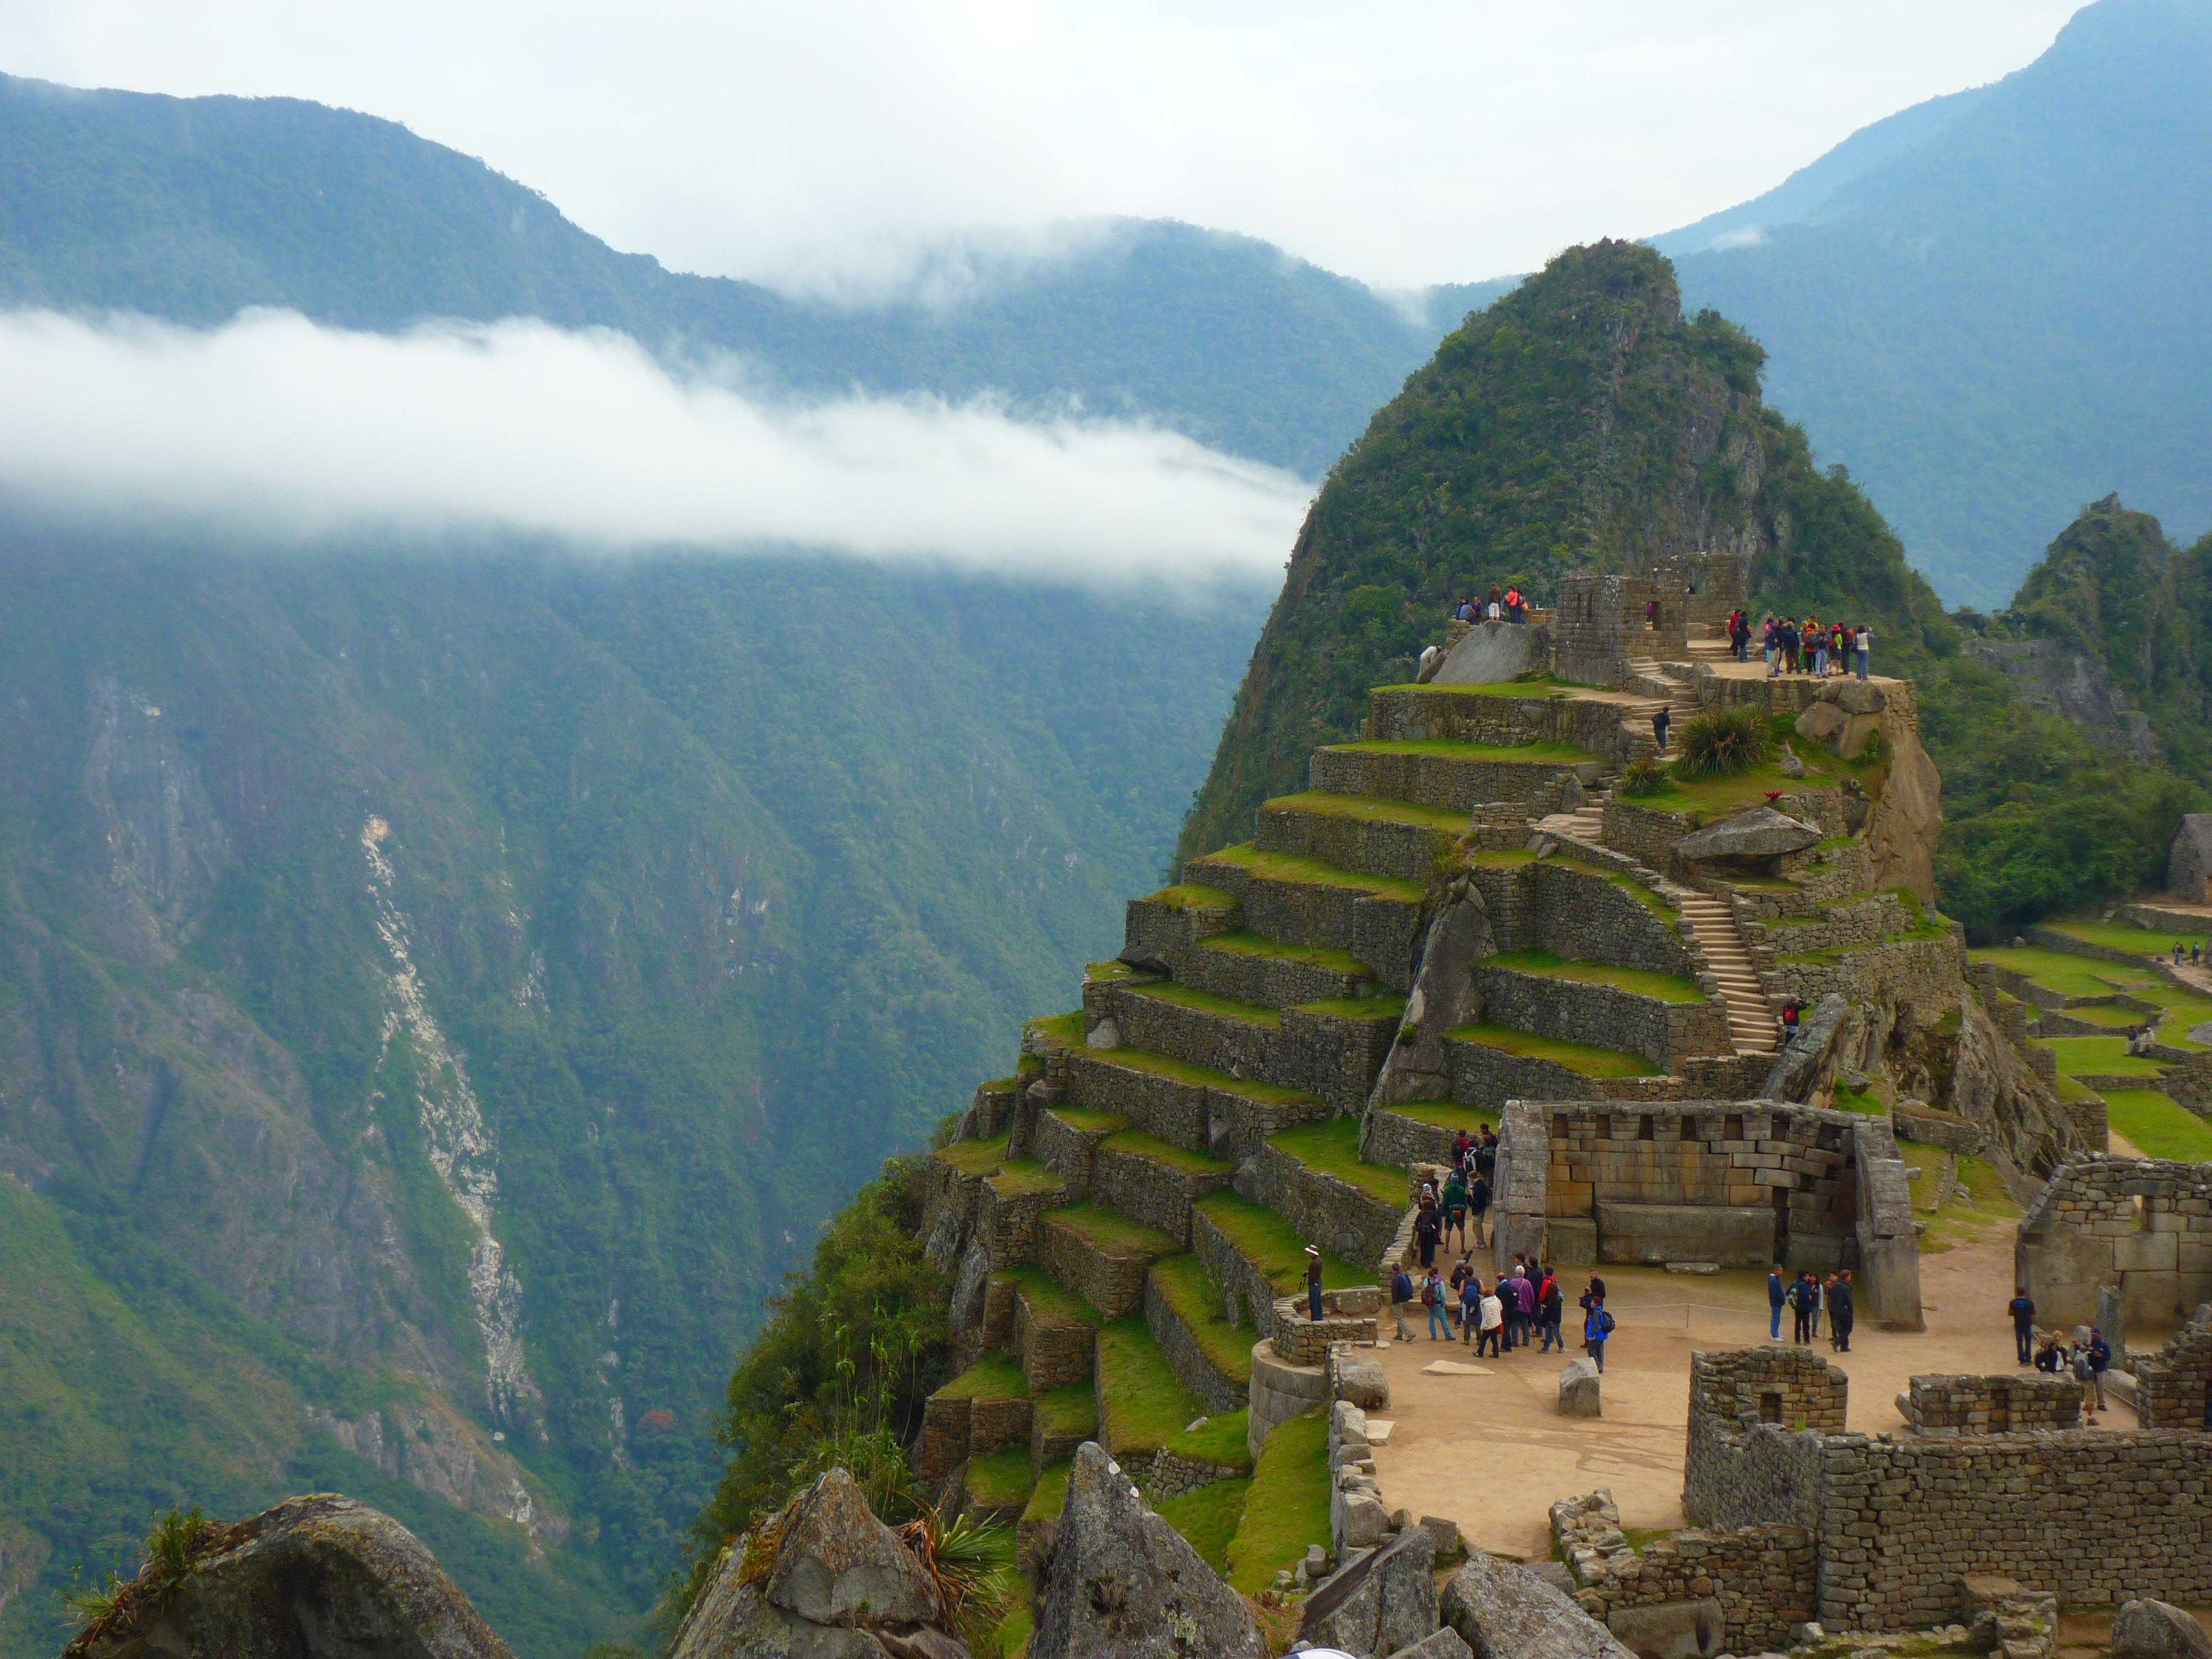 Fotos Gratis Paisaje Montaña Arquitectura Colina